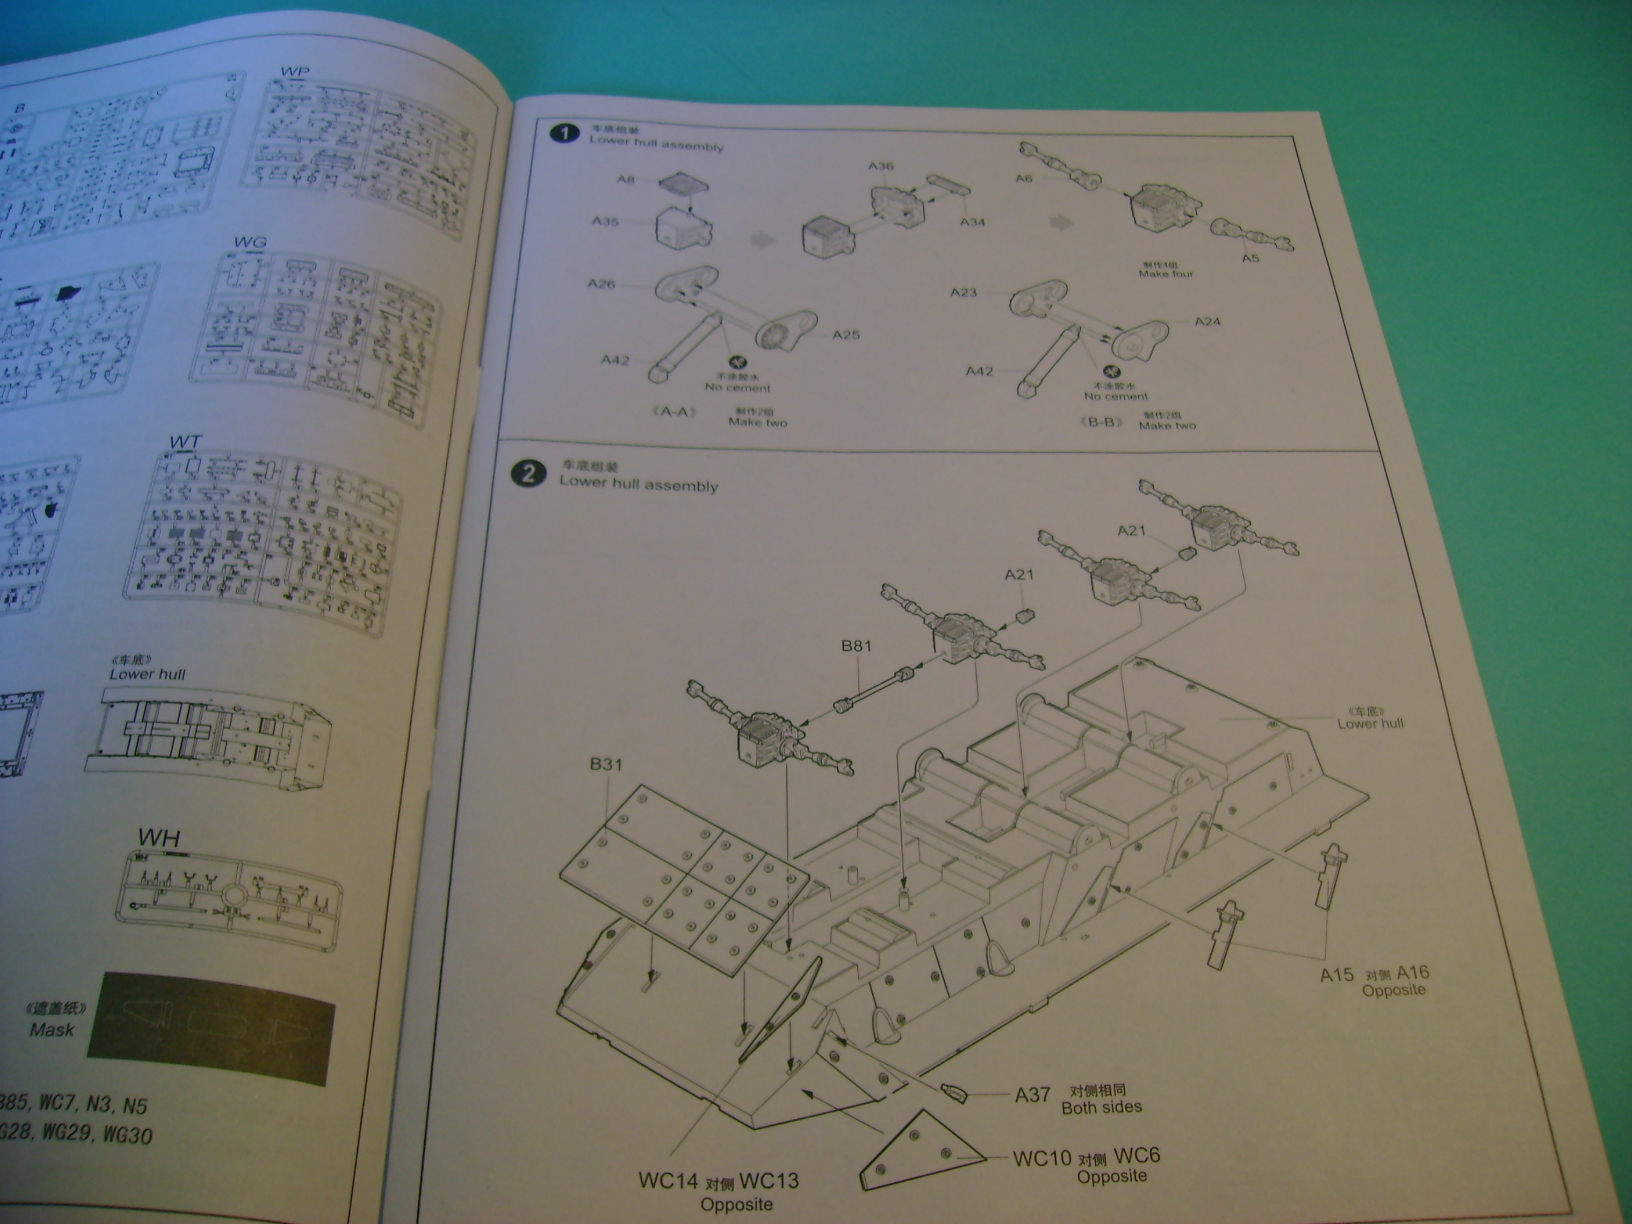 Review Kit M1129 Stryker Mortar Carrier Vehicle MC-B Trumpeter 1/35... Dsc02231a